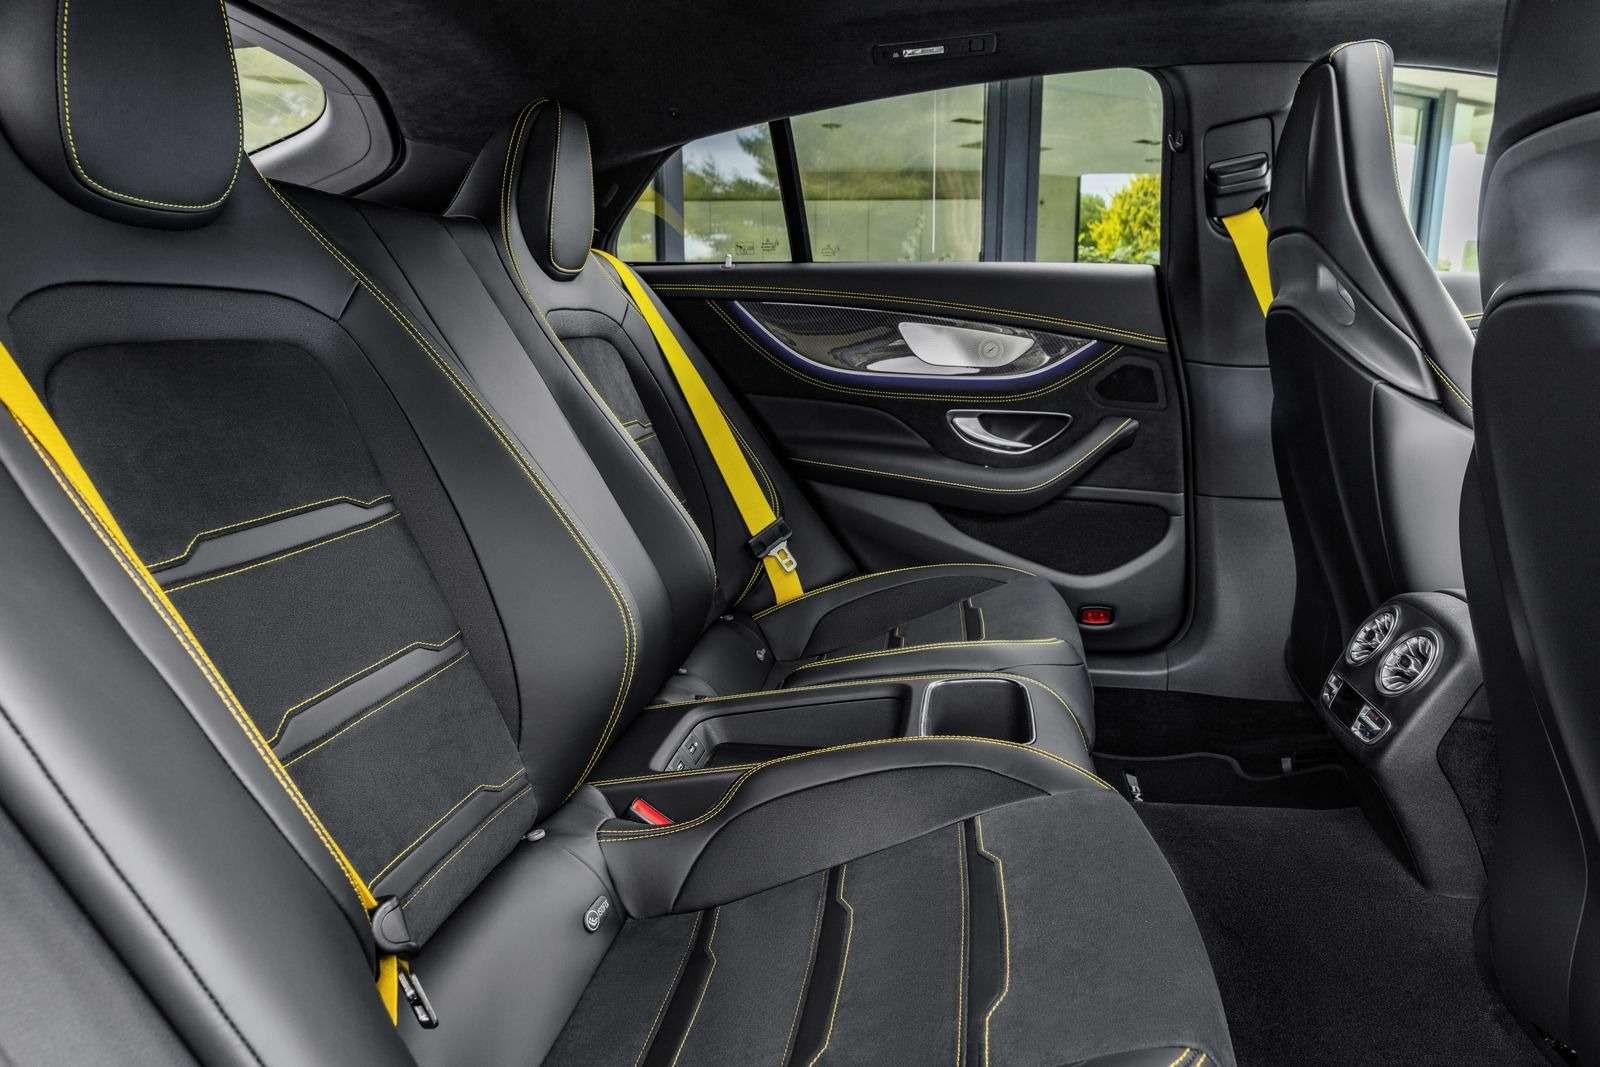 Подмена! Пятидверный Mercedes-AMG GTполучил «тележку» Е-класса— фото 851524